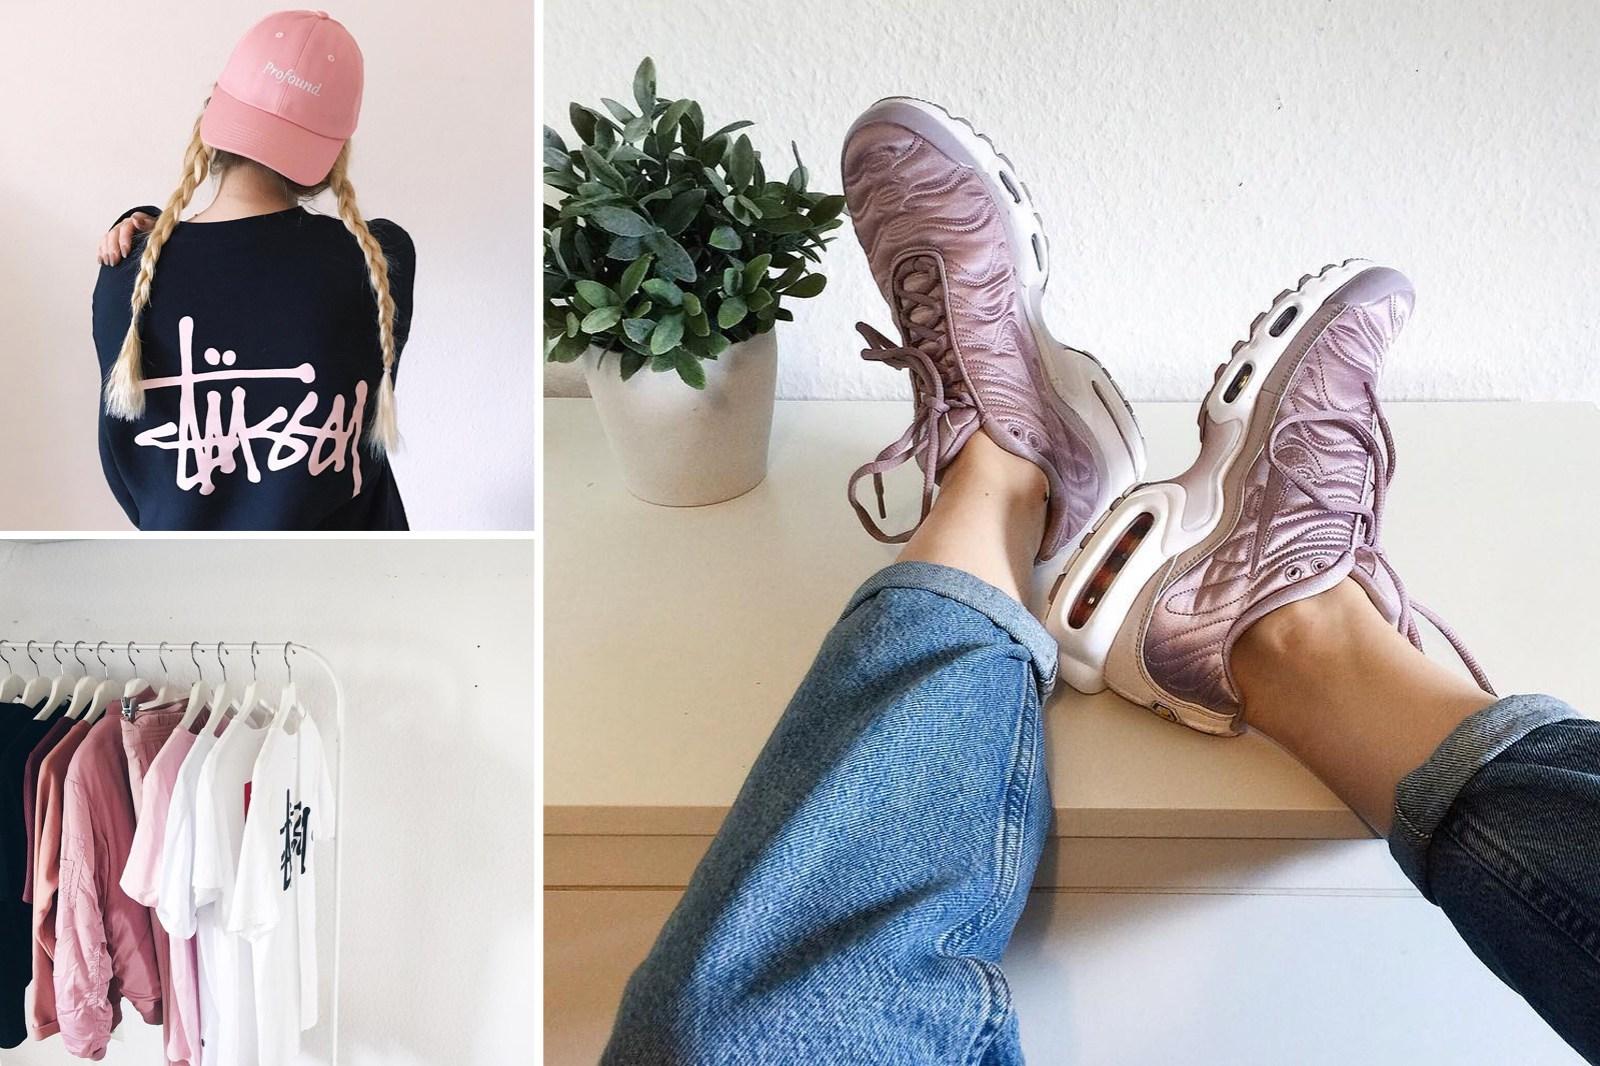 Instagram Follow 2017 youngjun koo Aleia Murawski Supreme Art champion